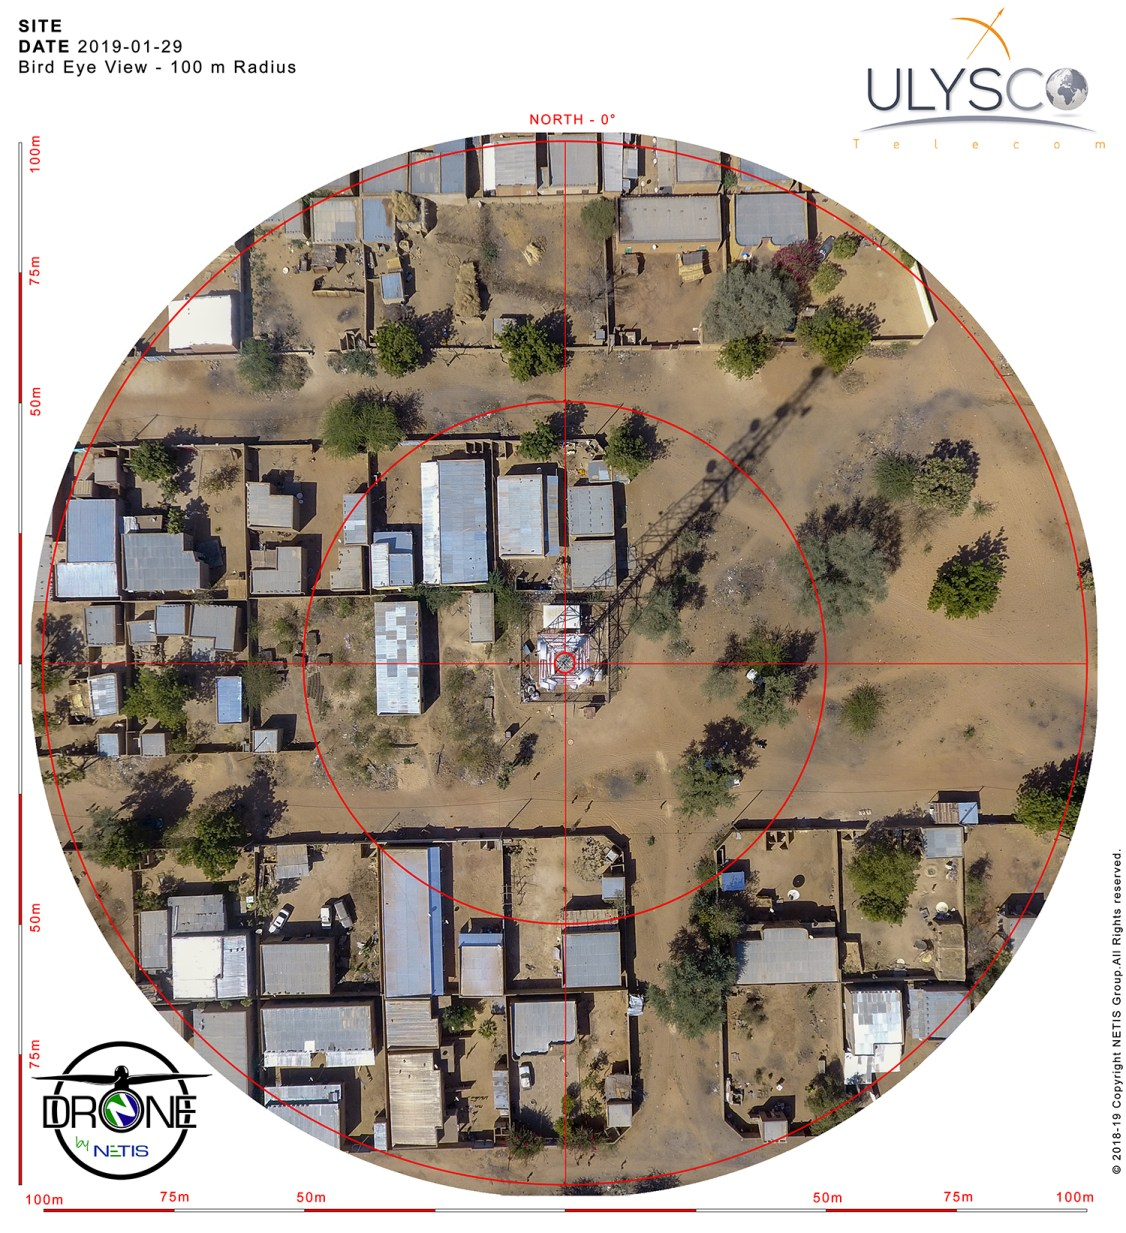 DRONE by NETIS - BURKINA FASO Operation - BIRD EYE VIEW 100m Radius - February 2109